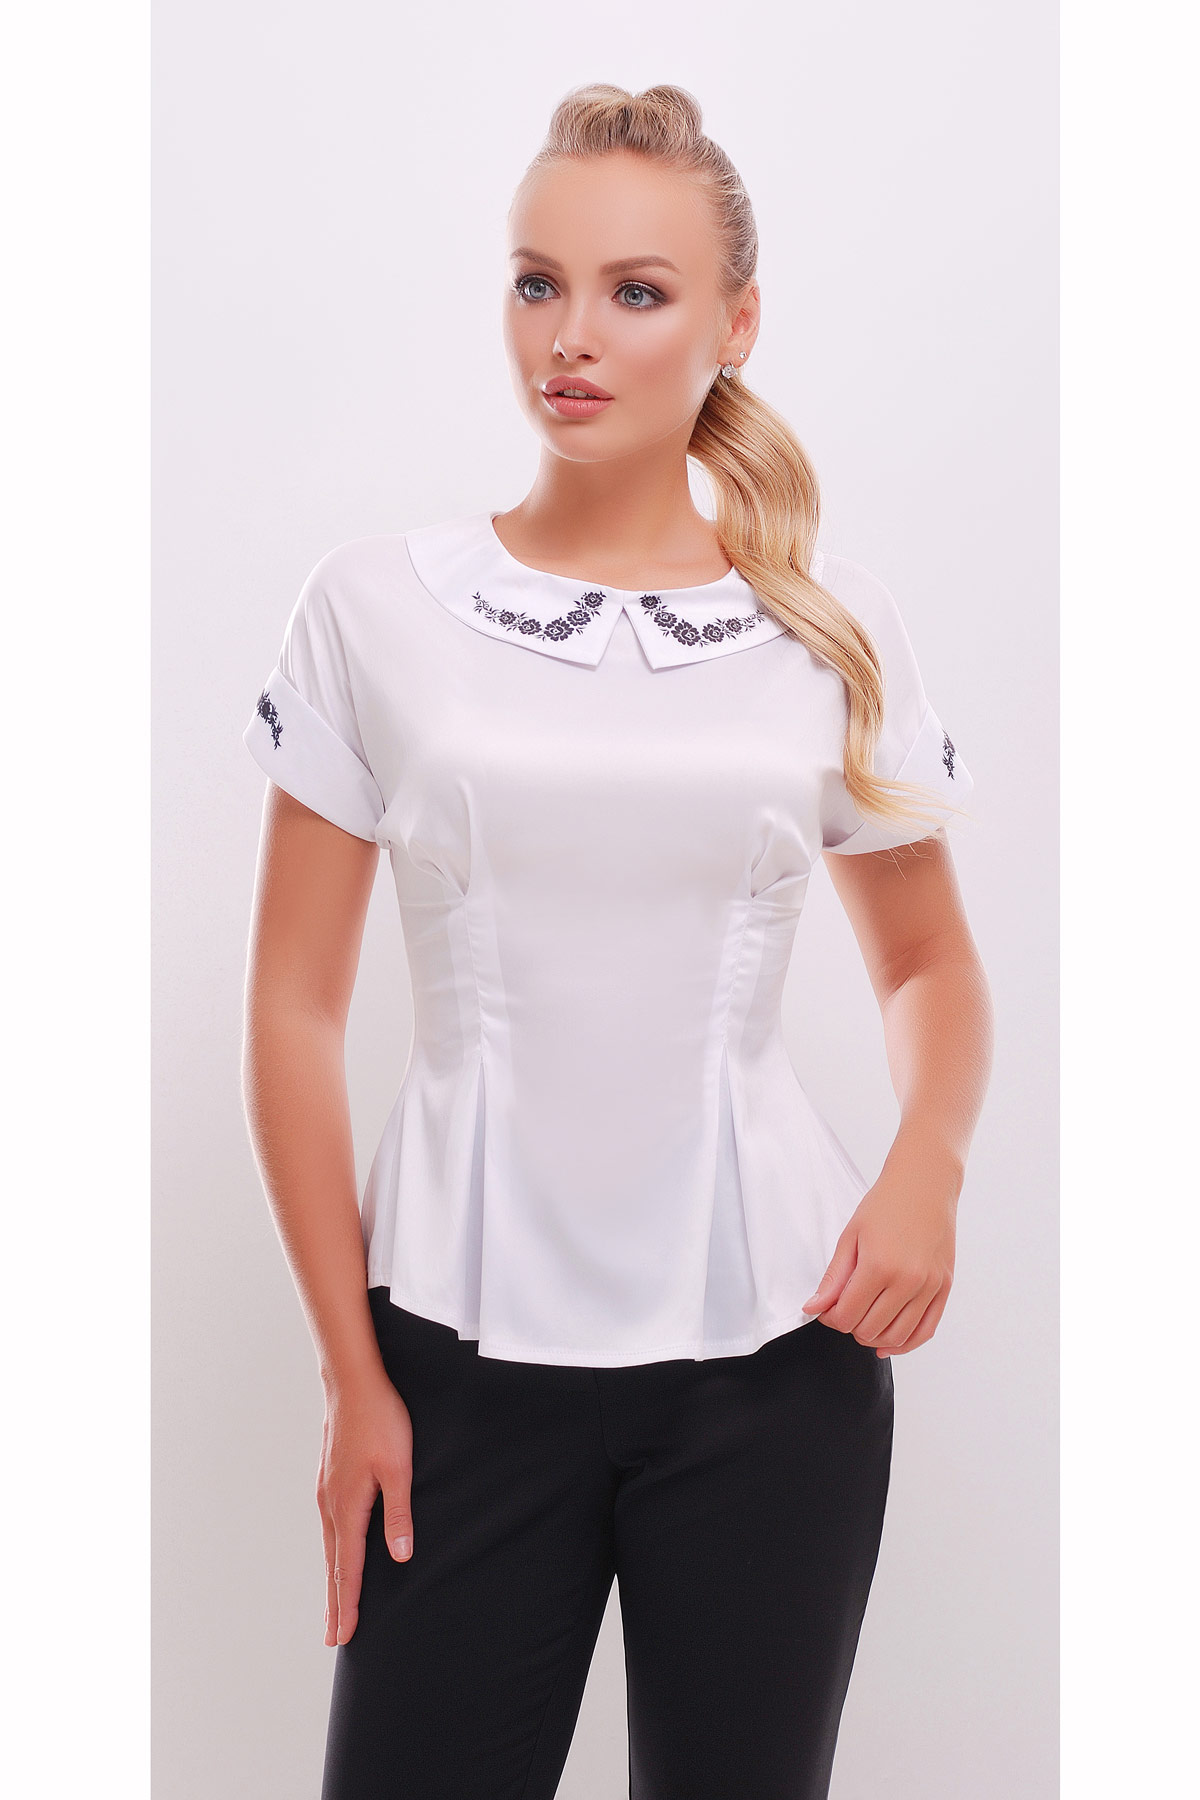 9a848aadc72 приталенная блузка с коротким рукавом. Цветы блуза Милада к р. Цвет  белый